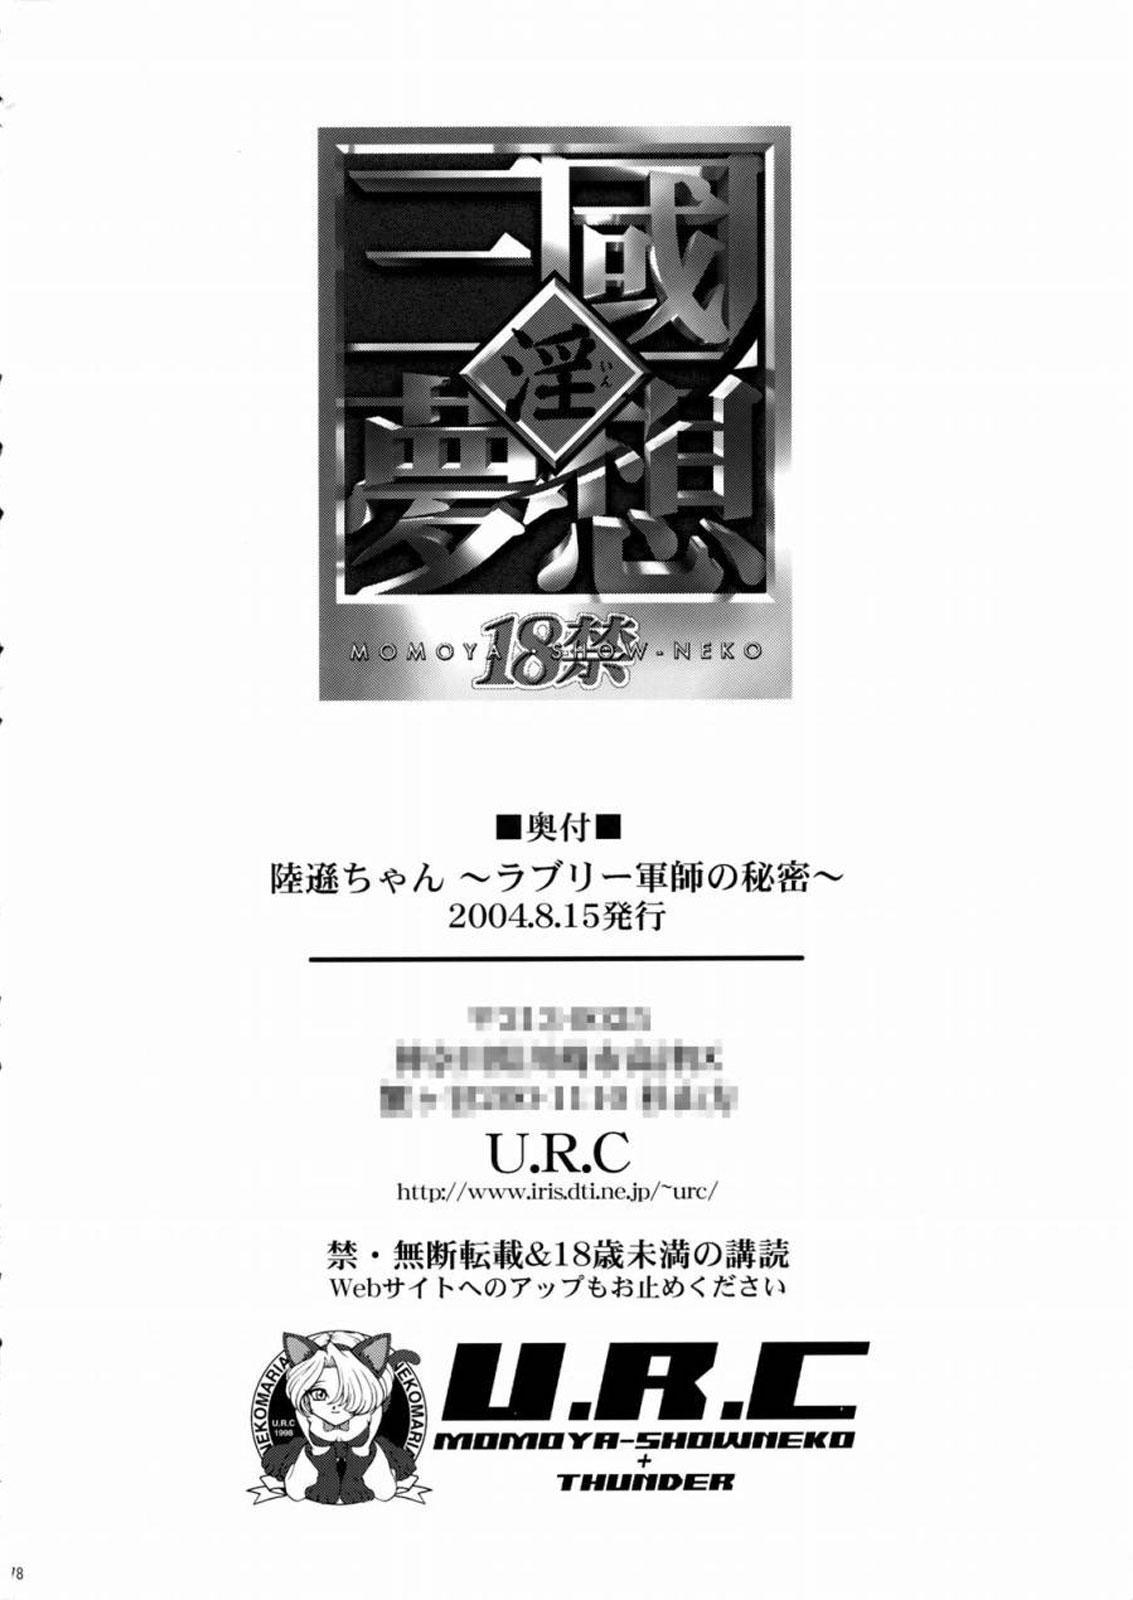 (C66) [U.R.C (Momoya Show-Neko)] Rikuson-chan ~Lovely Gunshi no Himitsu~ | Rikuson-chan Secret of The Lovely Strategist (Dynasty Warriors) [English] [SaHa] 76